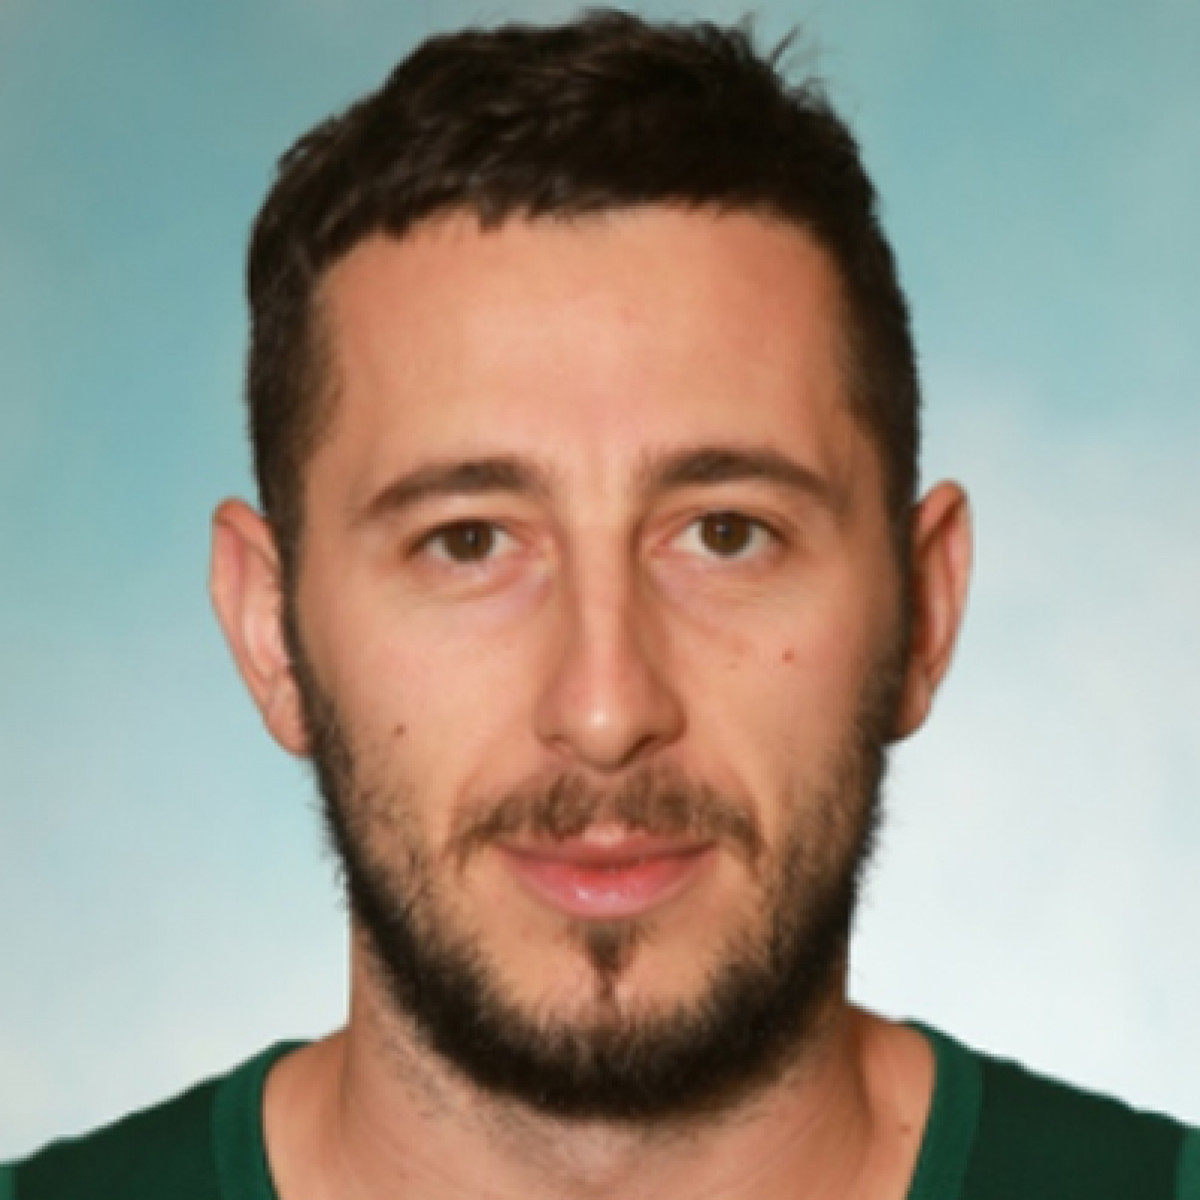 Lazar Radosavljevic